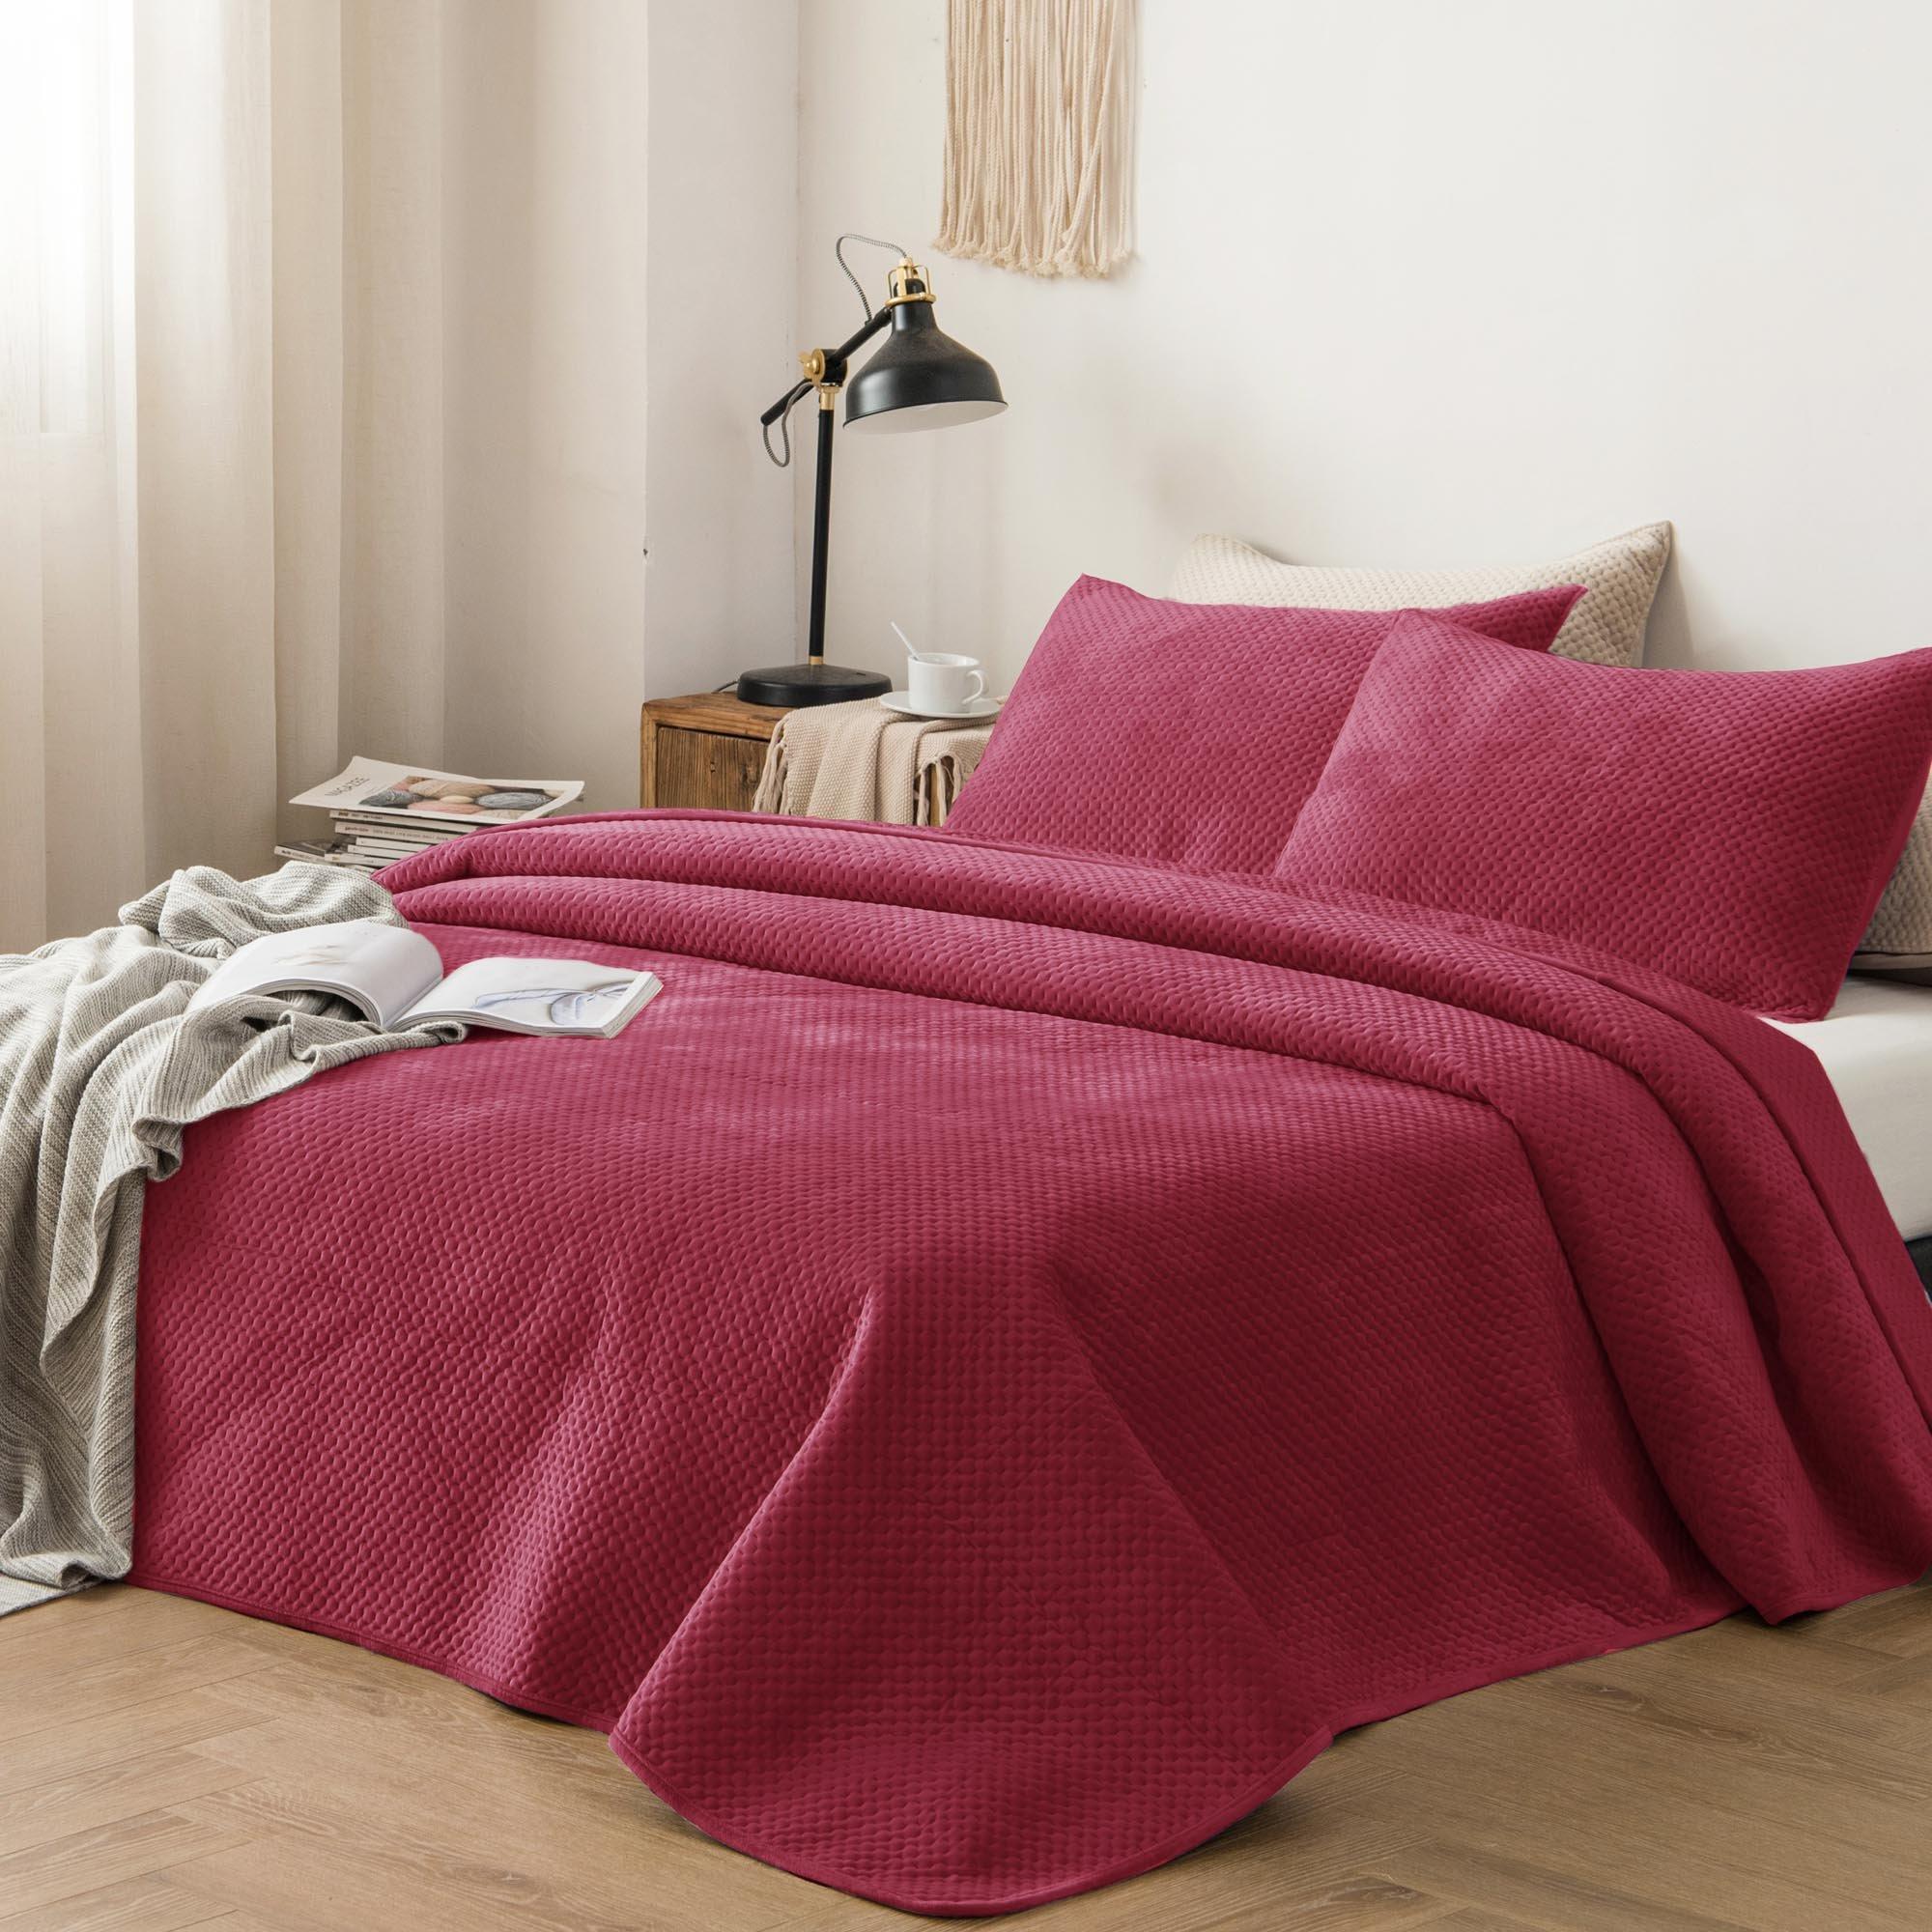 Winter Cozy Velveteen Bedspread With Shams for Bedroom, Guestroom